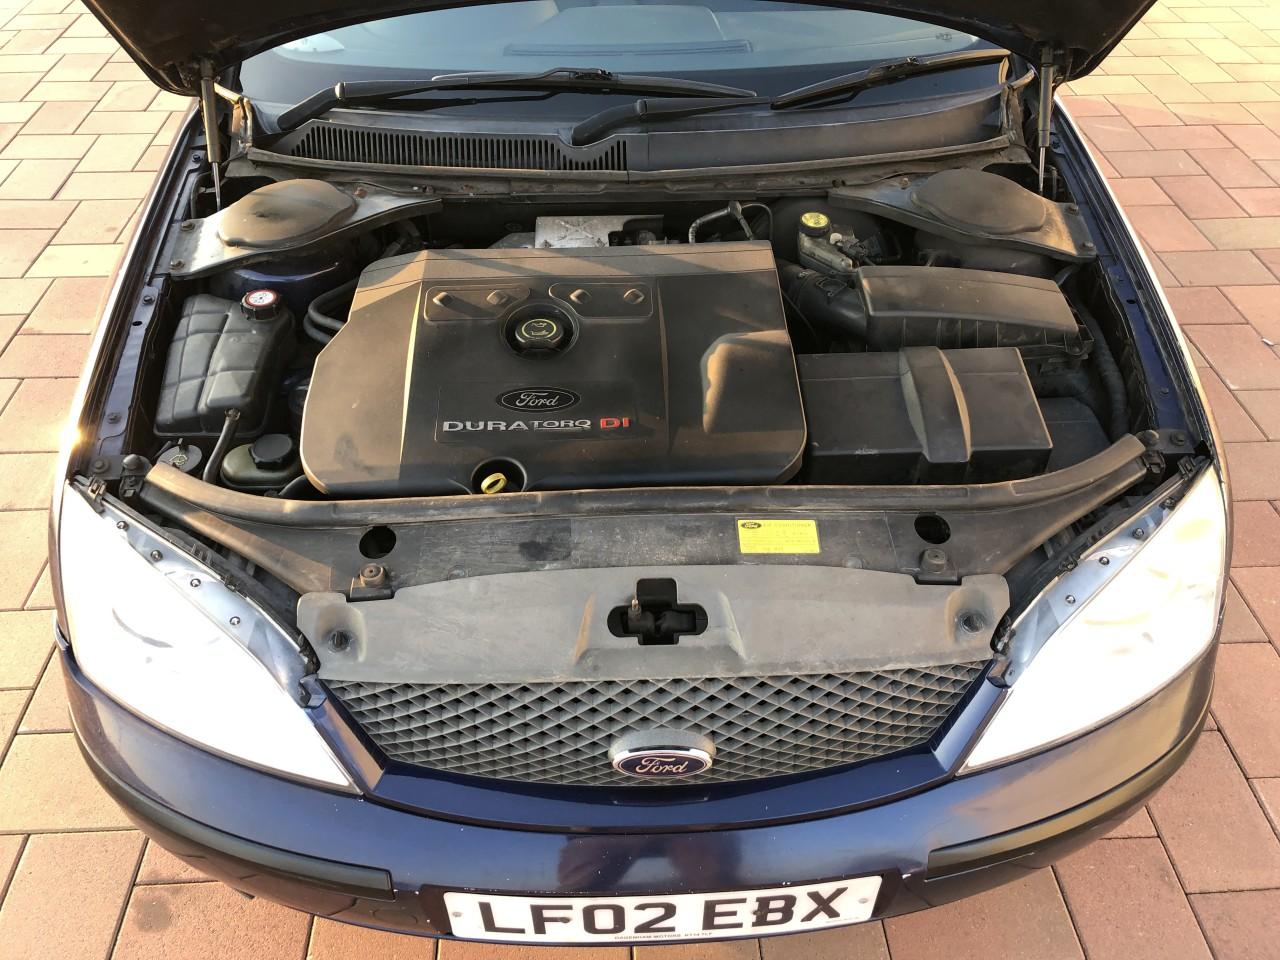 Ford Mondeo 2.0 tddi 2002